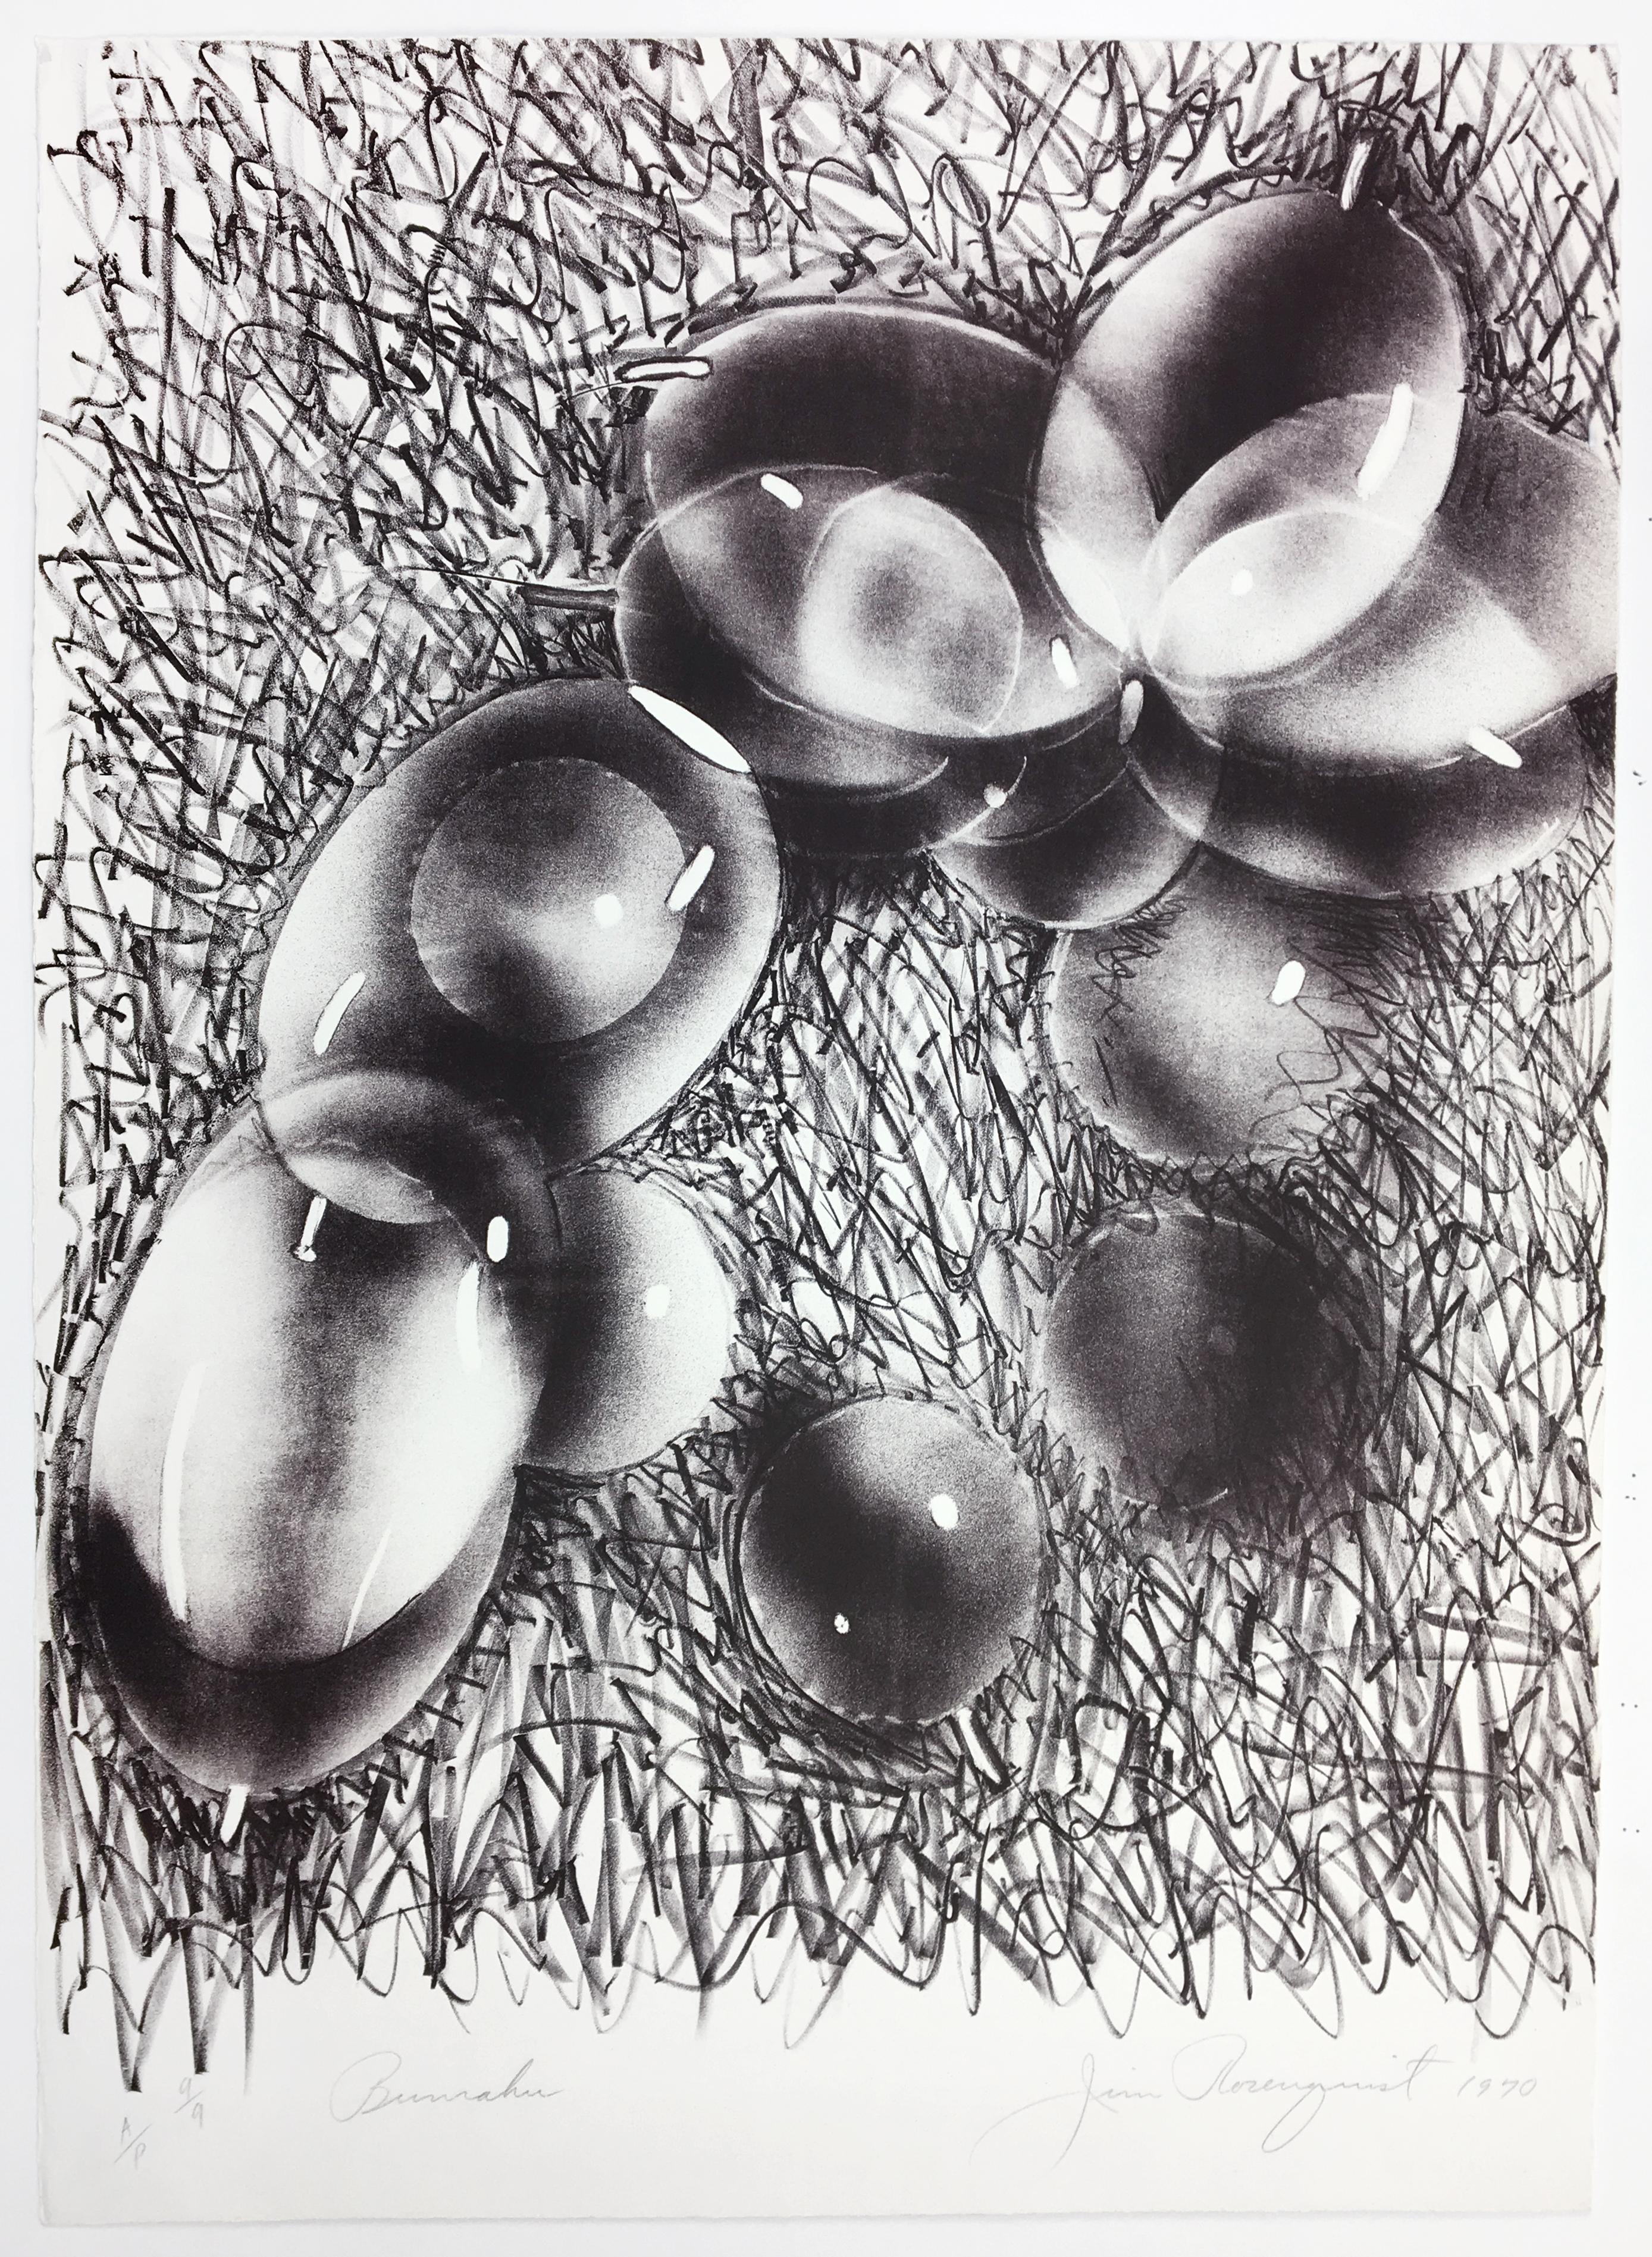 Bunraku, James Rosenquist, abstract Japanese puppetry monochrome Pop Art